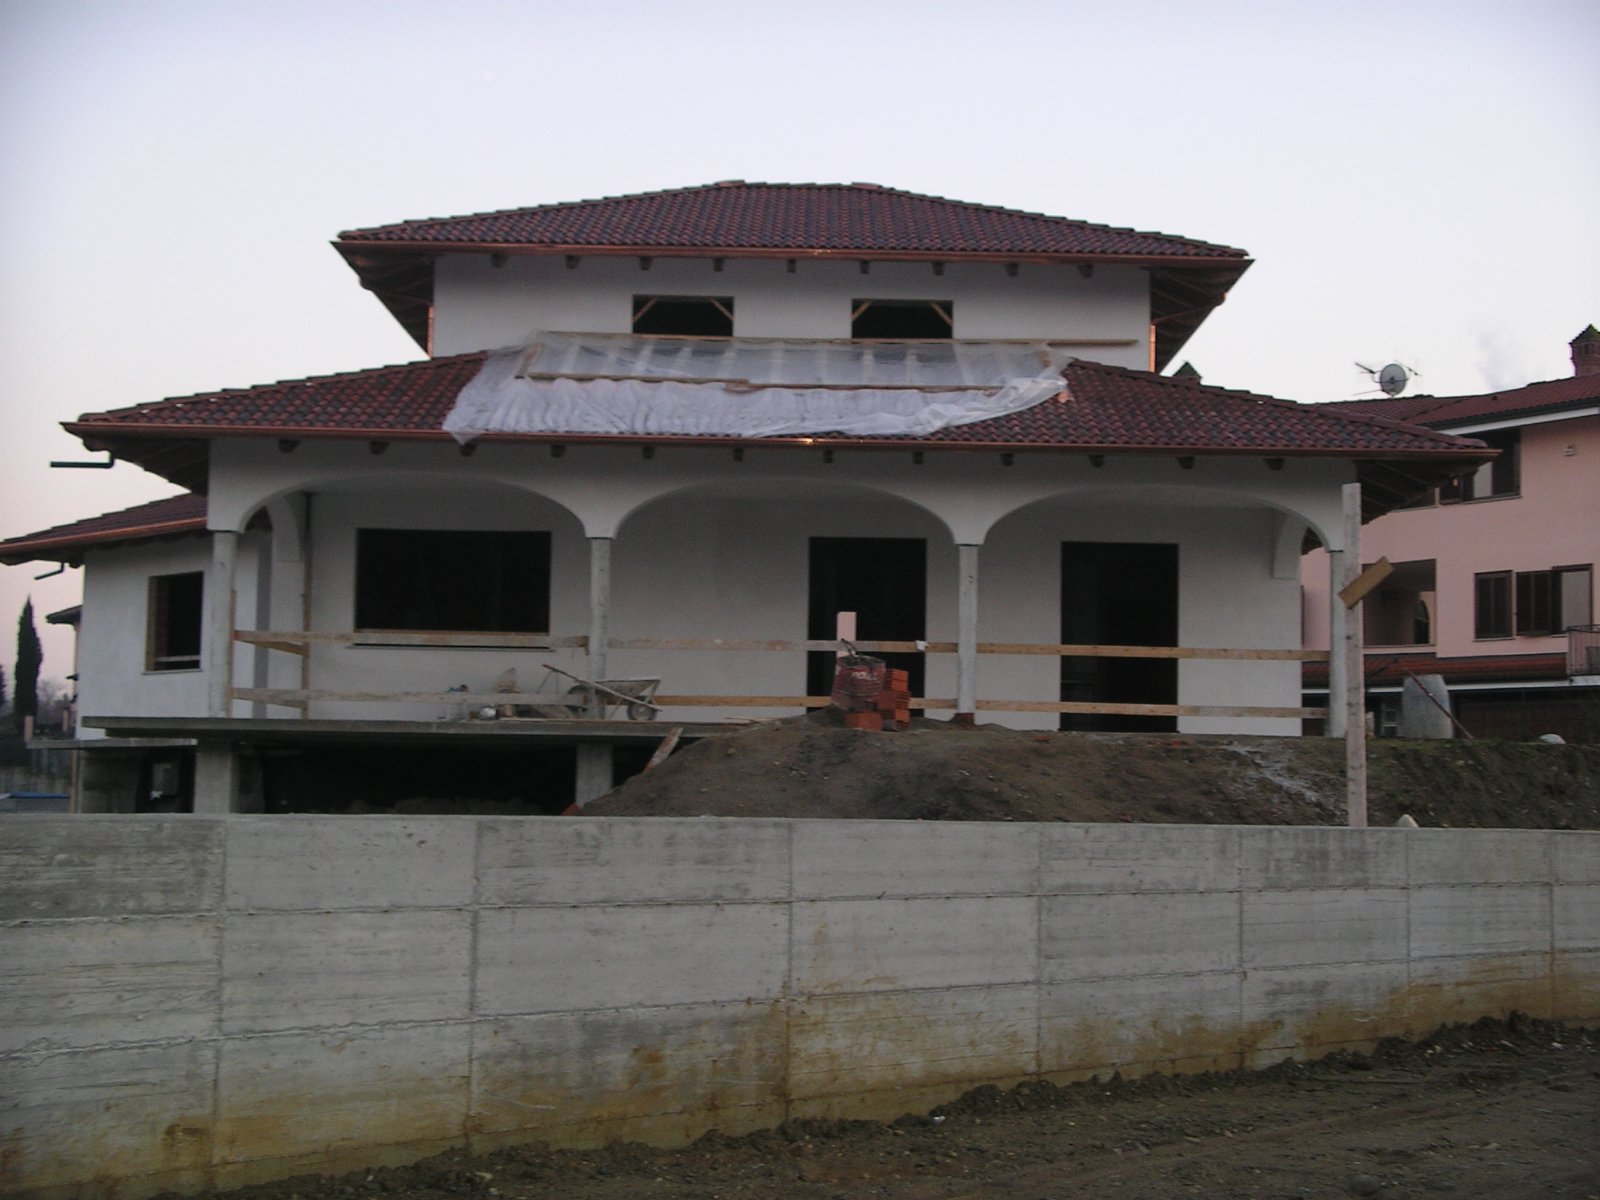 vista frontale di una casa bianca durante ristrutturazione